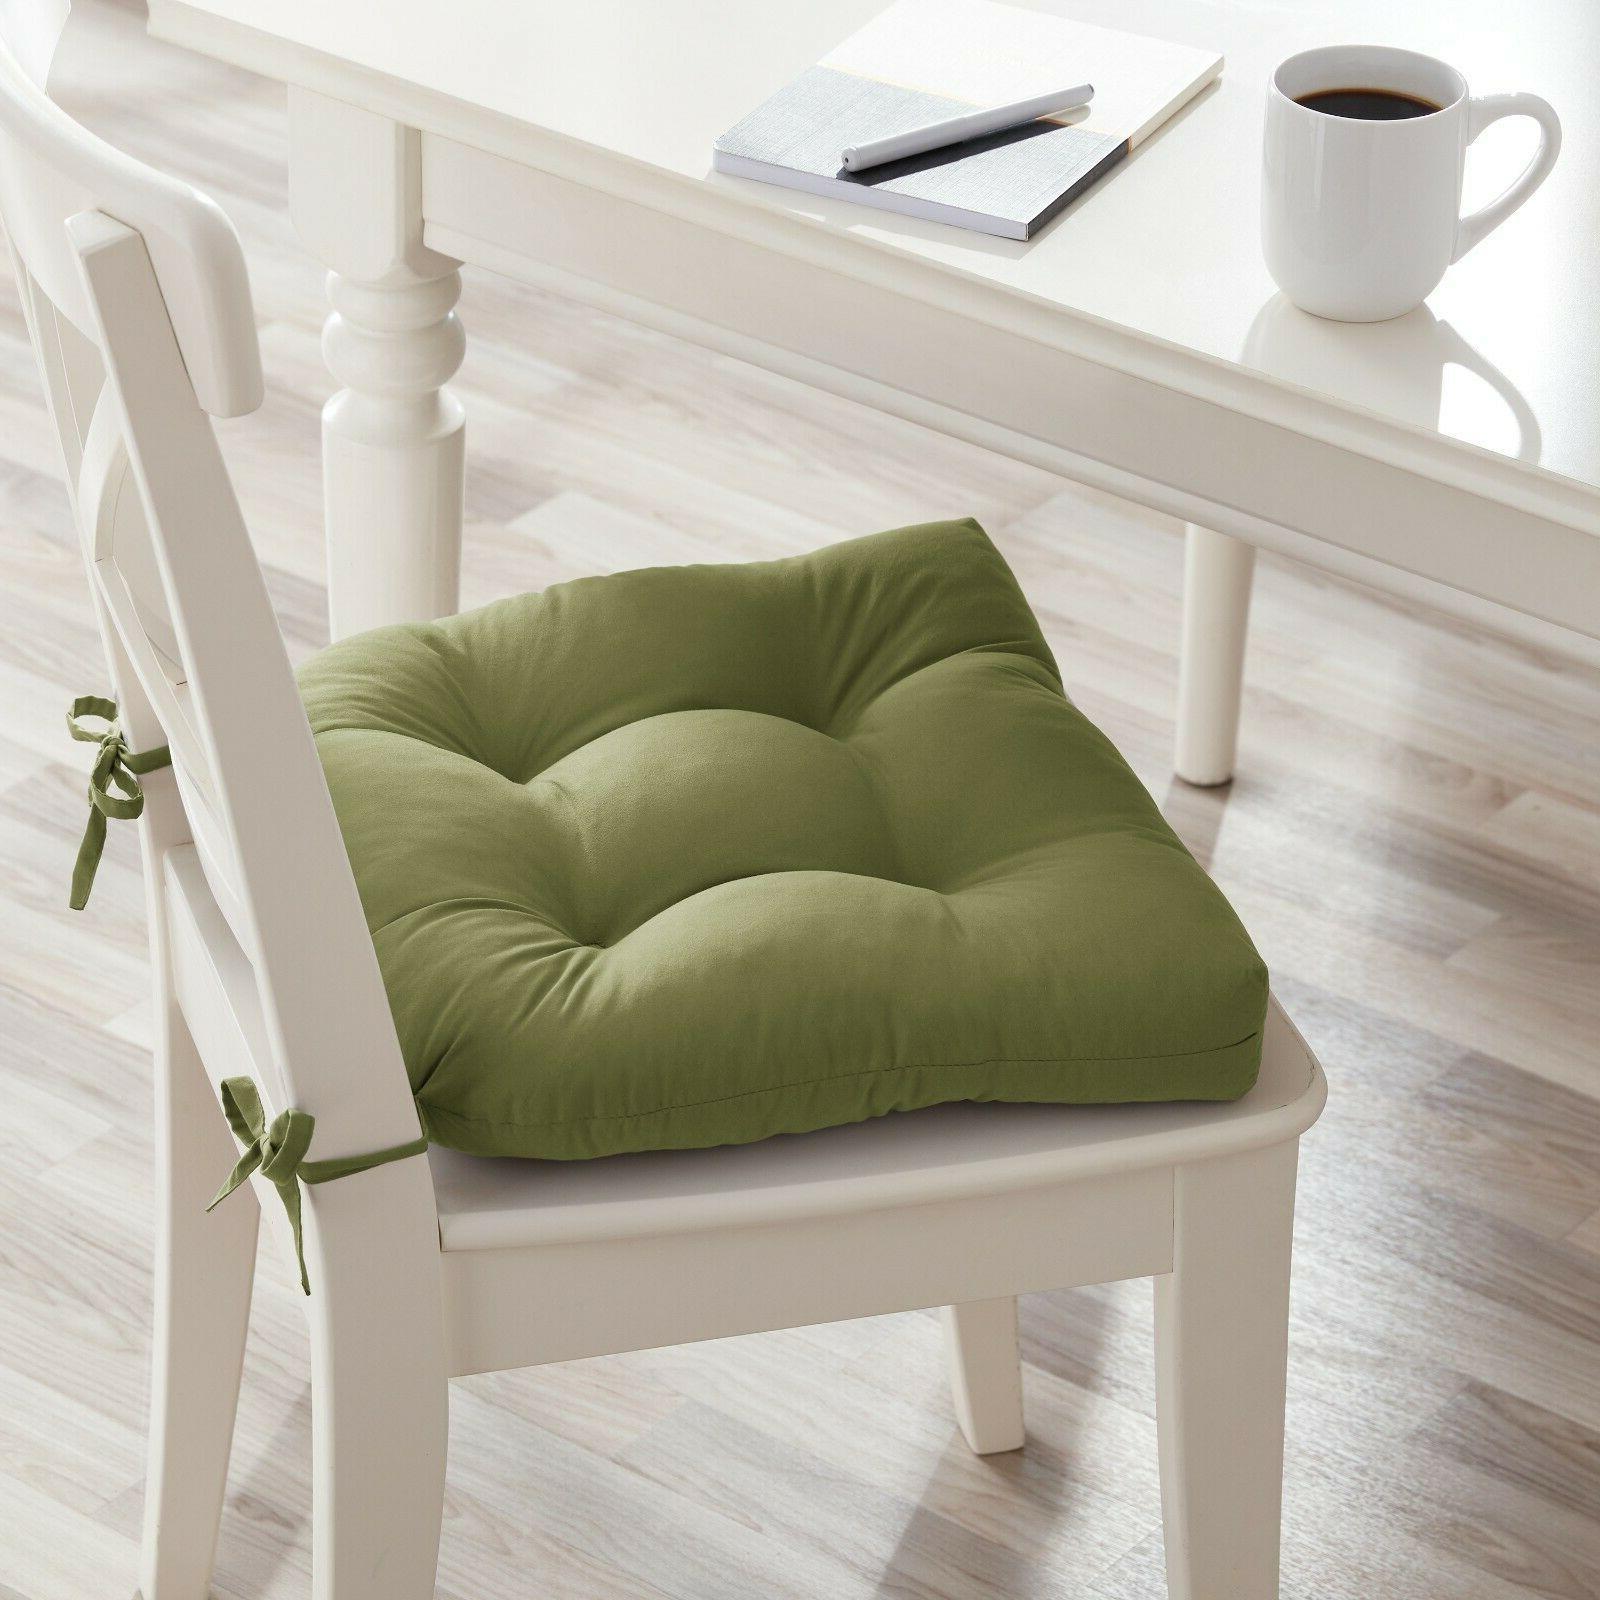 Chair 4-Pack Black